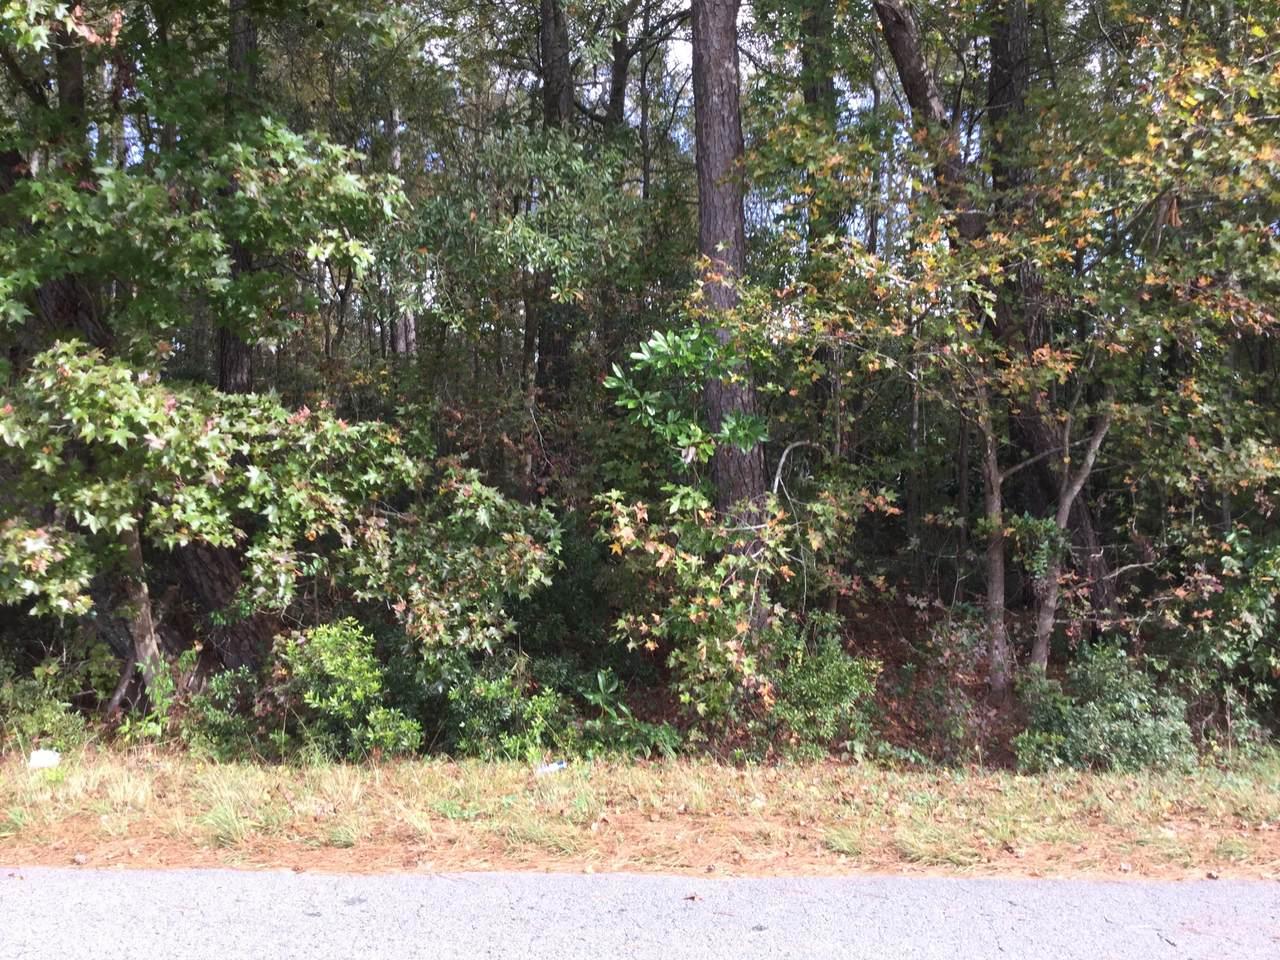 0 Haynesville Rd. Ext. - Photo 1